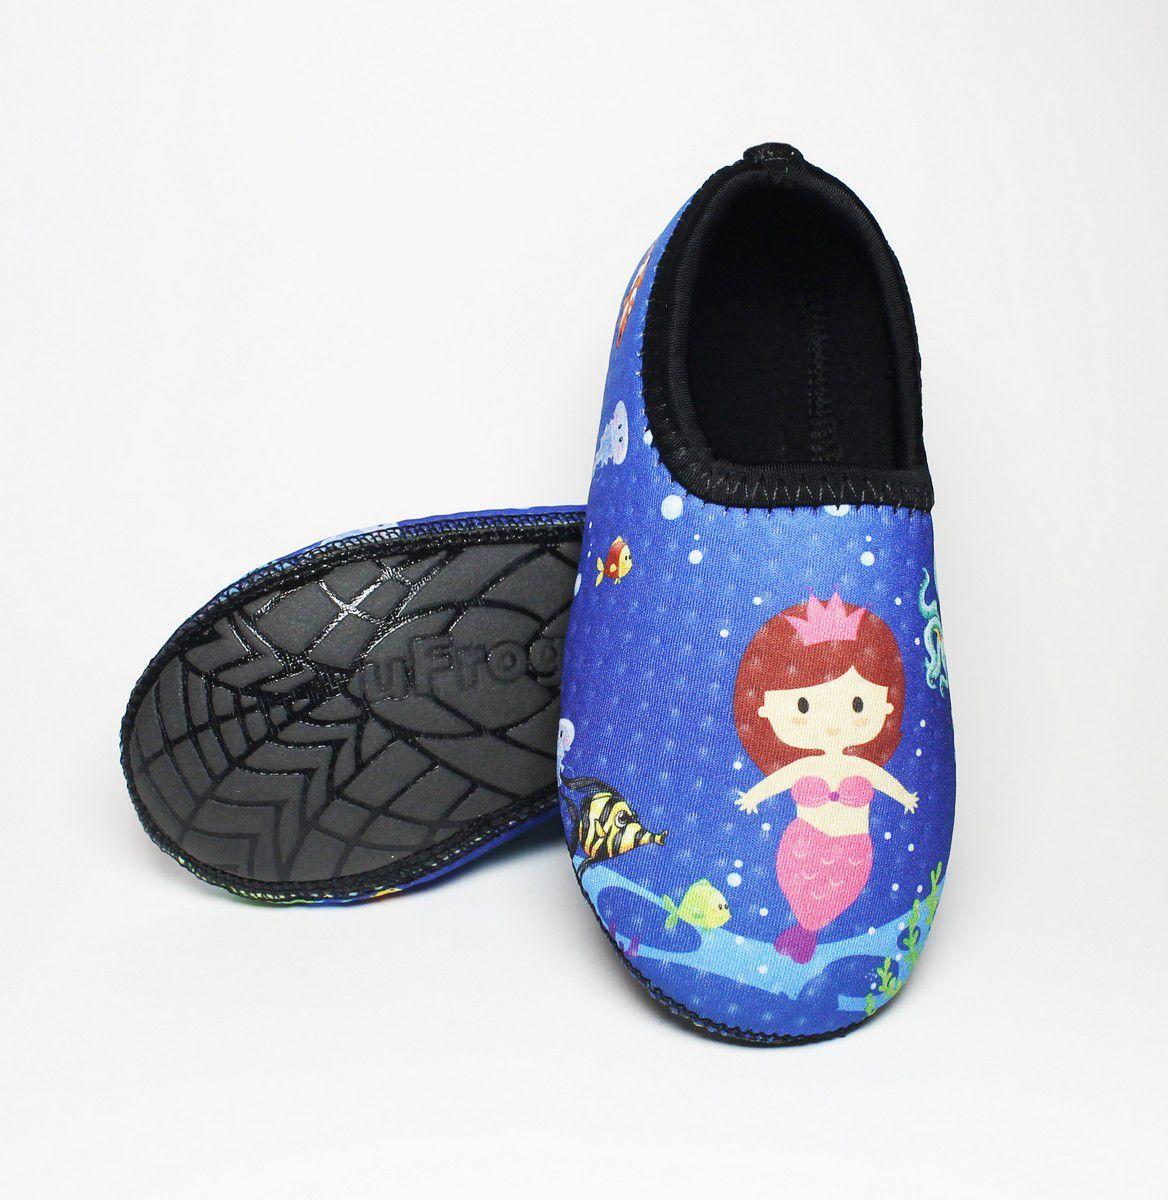 Sapato de Neoprene Fit Sereia Ufrog